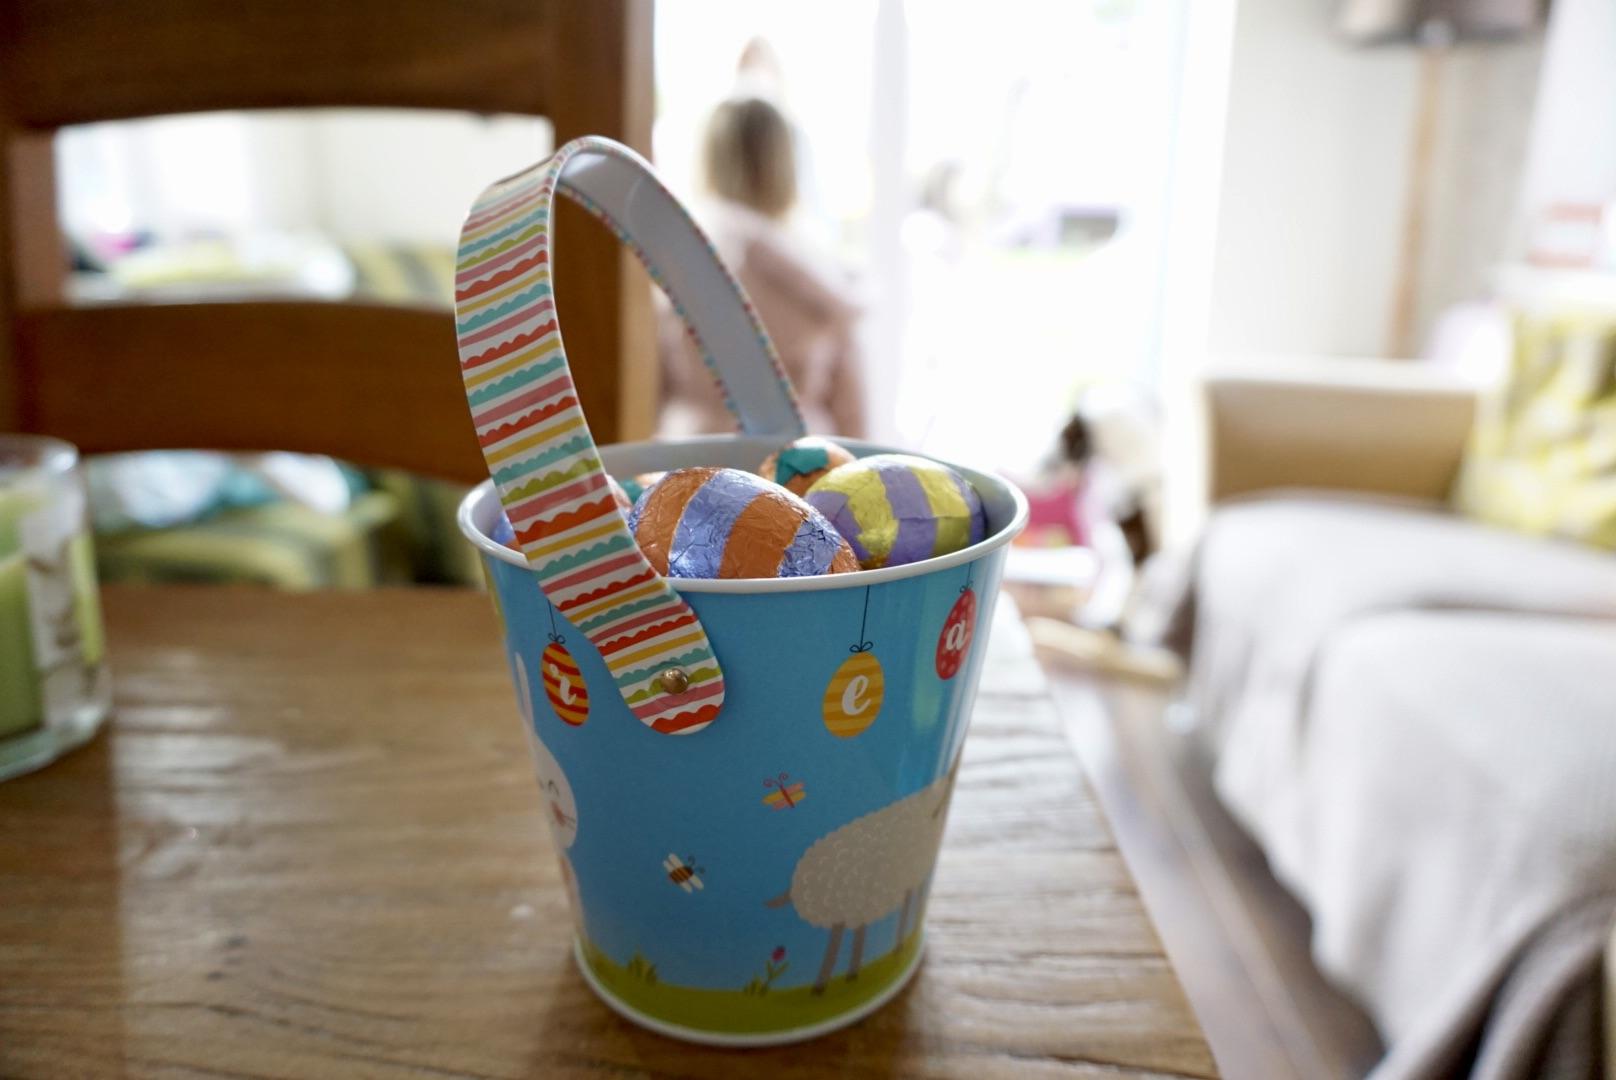 Easter egg hunt carrier